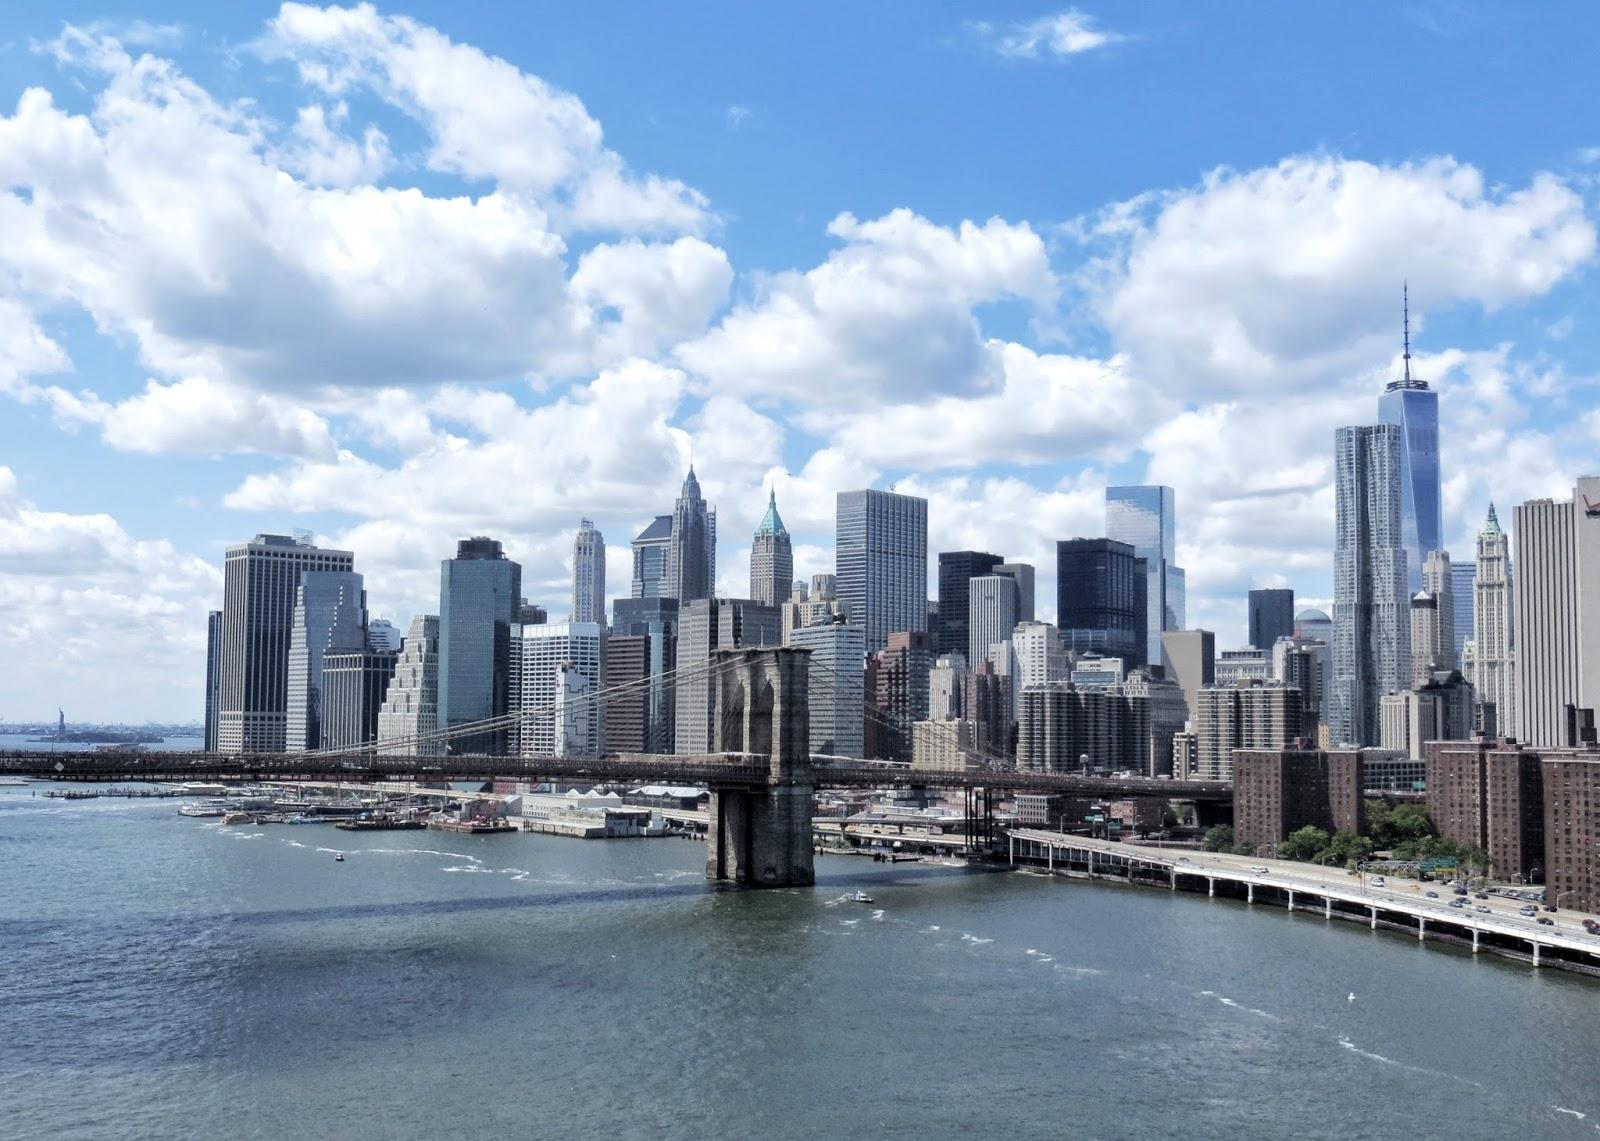 New York NYC USA Yhdysvallat Amerikka